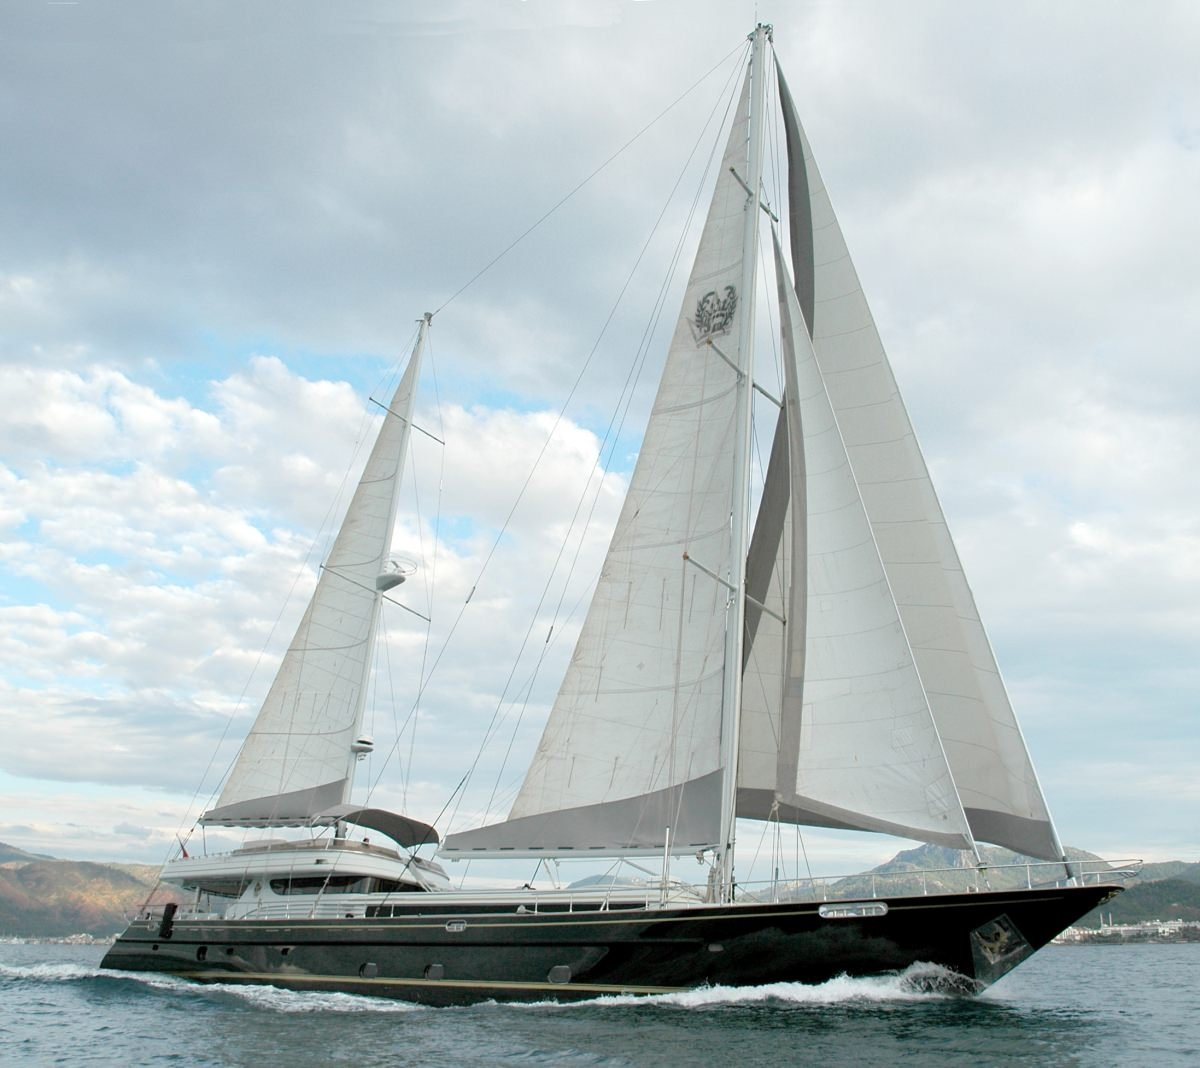 Sailing Yacht 'SUHEYLA', 12 PAX, 6 Crew, 131.00 Ft, 40.00 Meters, Built 1990, Karyat , Refit Year 2009